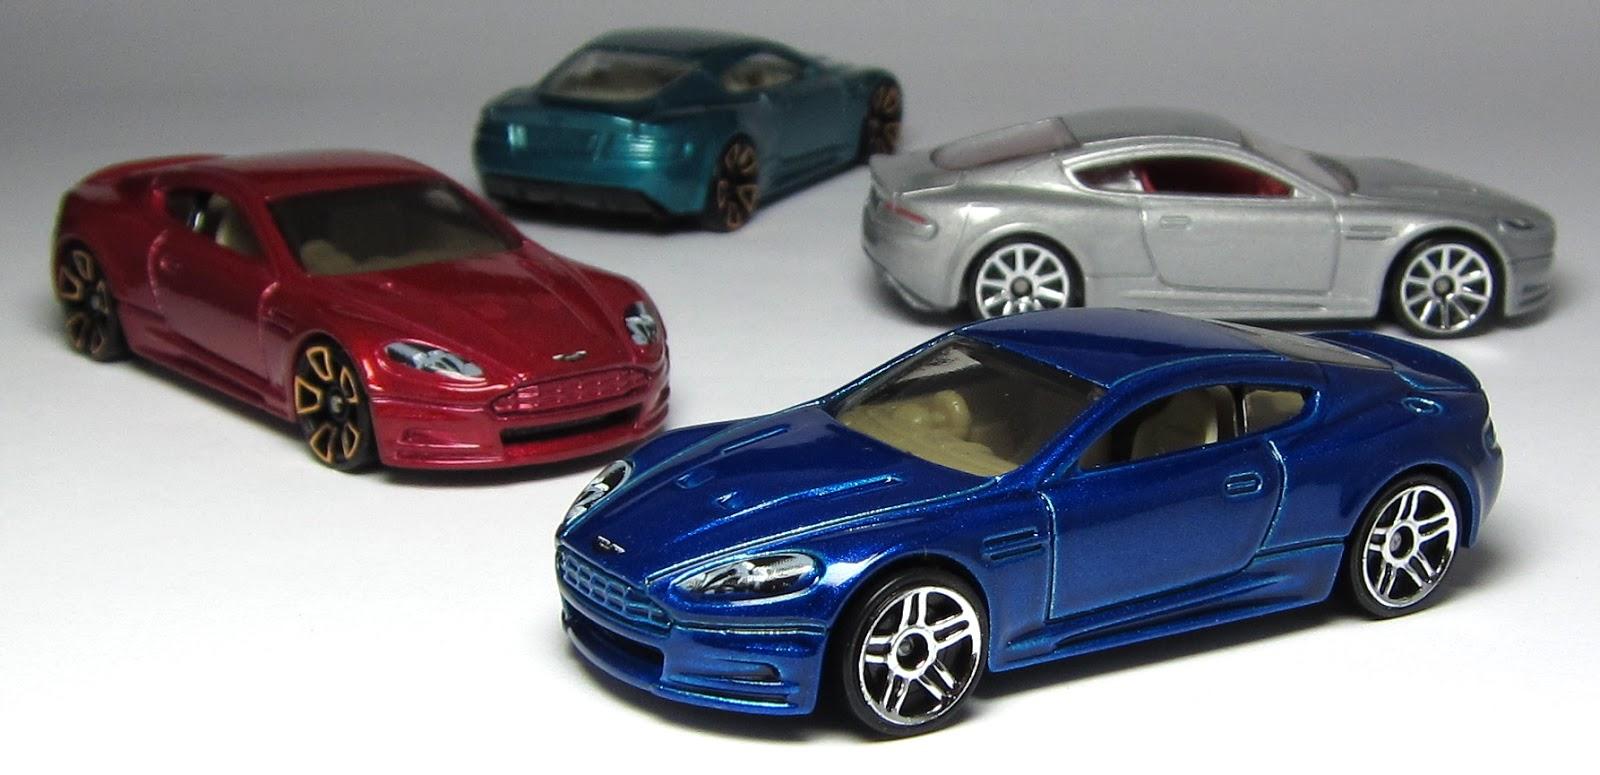 First Look Hot Wheels Aston Martin Dbs In Blue And All The Dbs Wheel Varis Lamleygroup